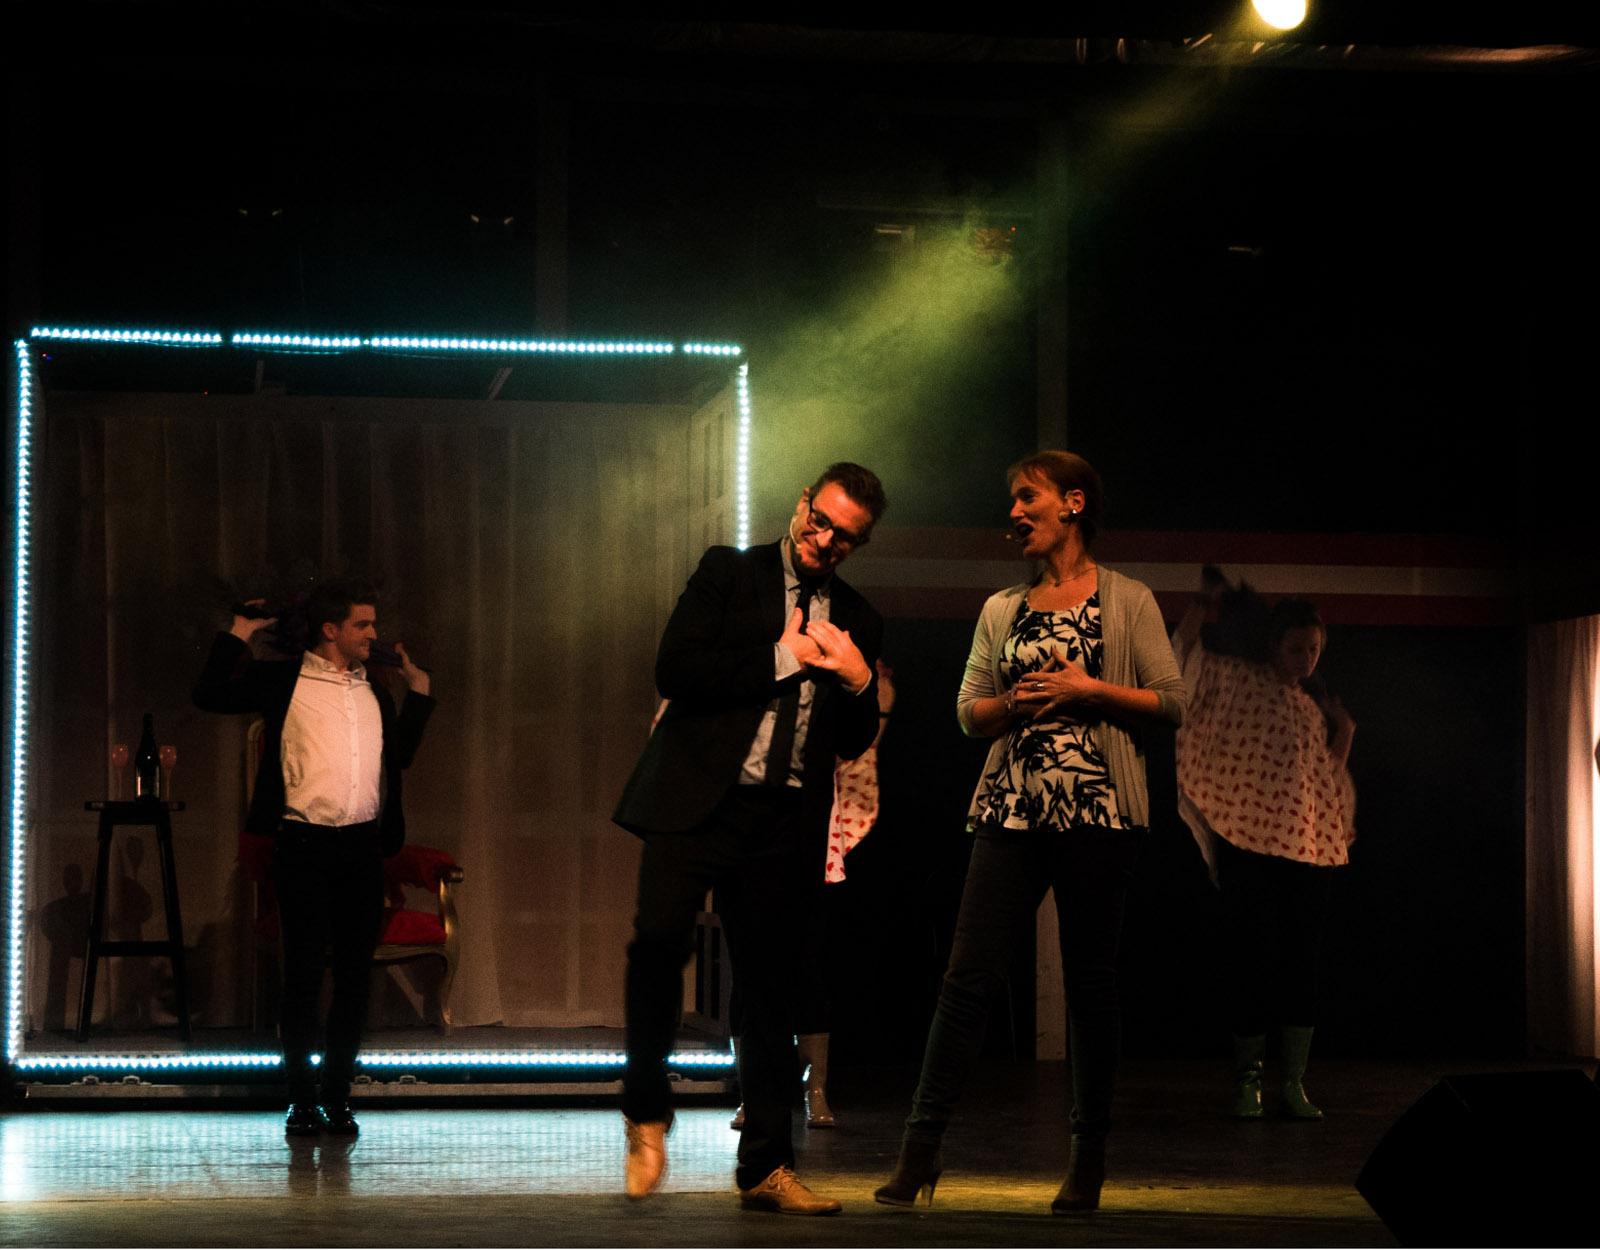 Singing in the rain - De Voljeir - Ann Verté, Harry Philips